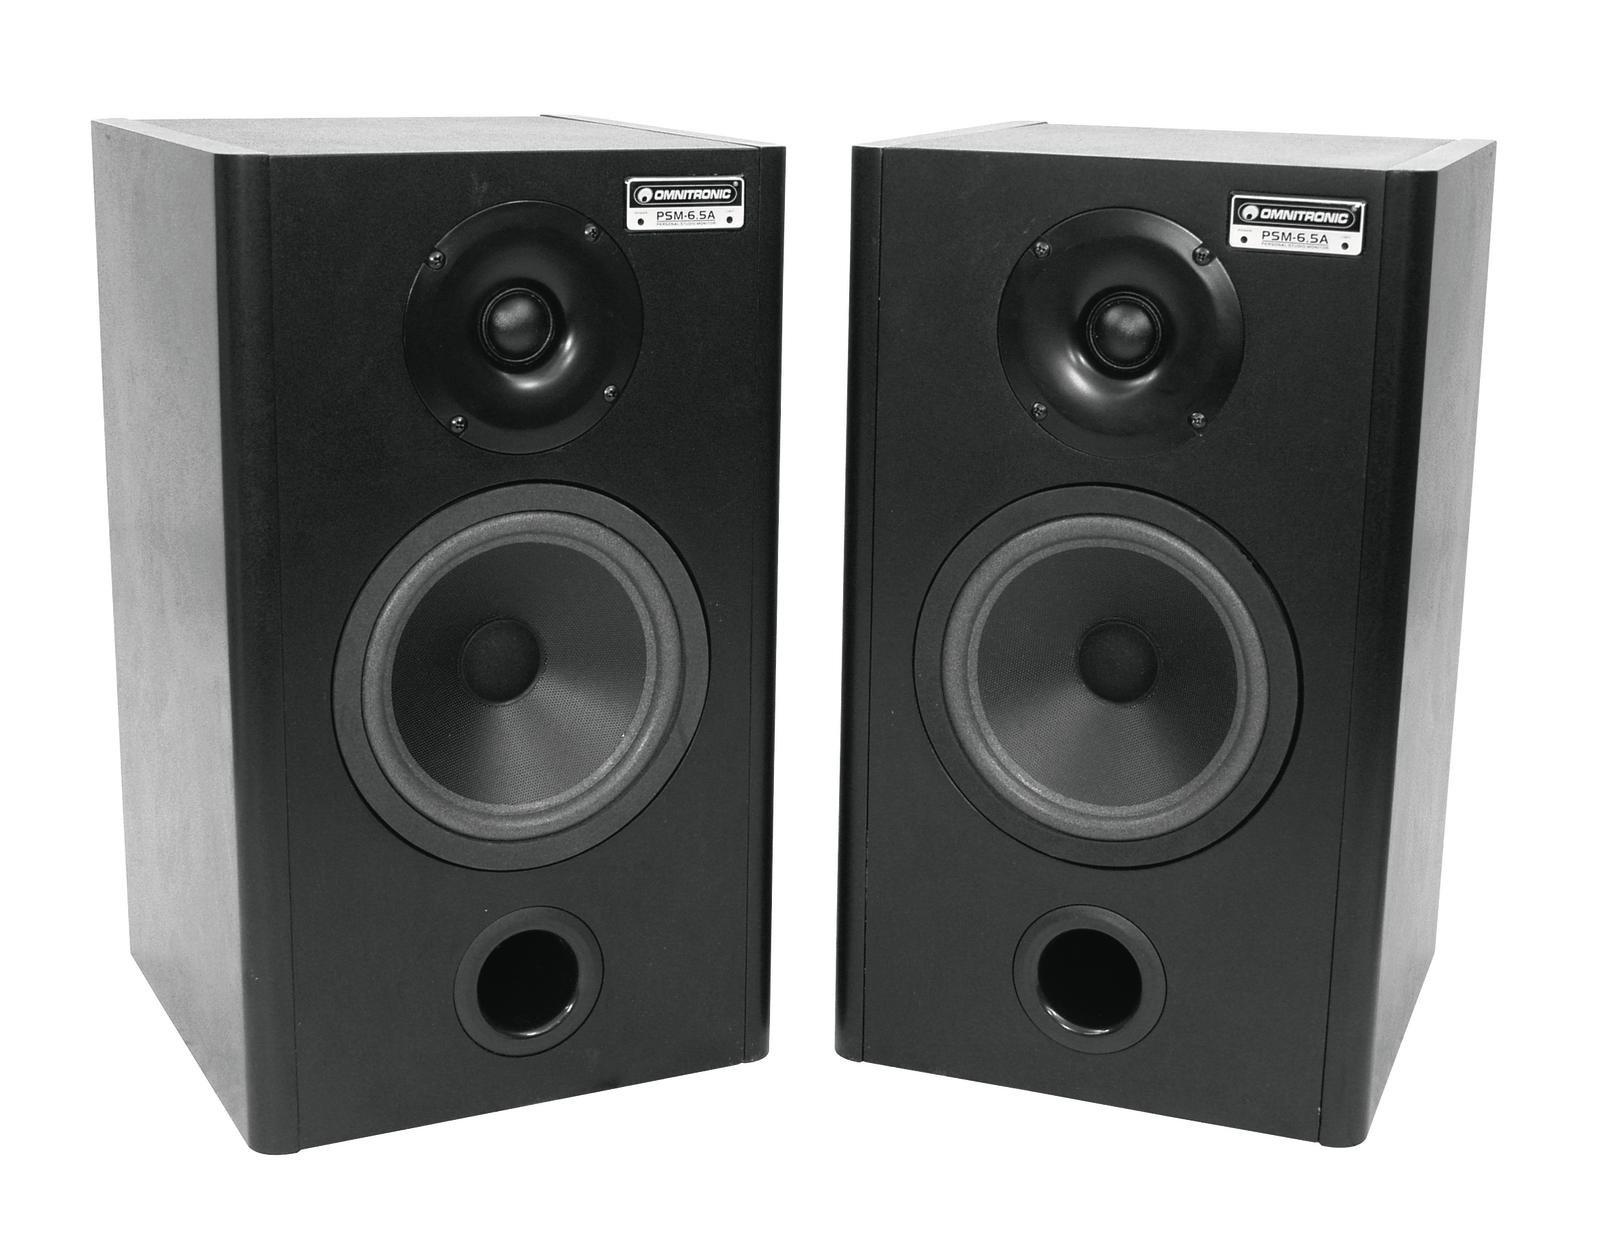 OMNITRONIC PSM-6.5A, Studio-Monitor/Paar